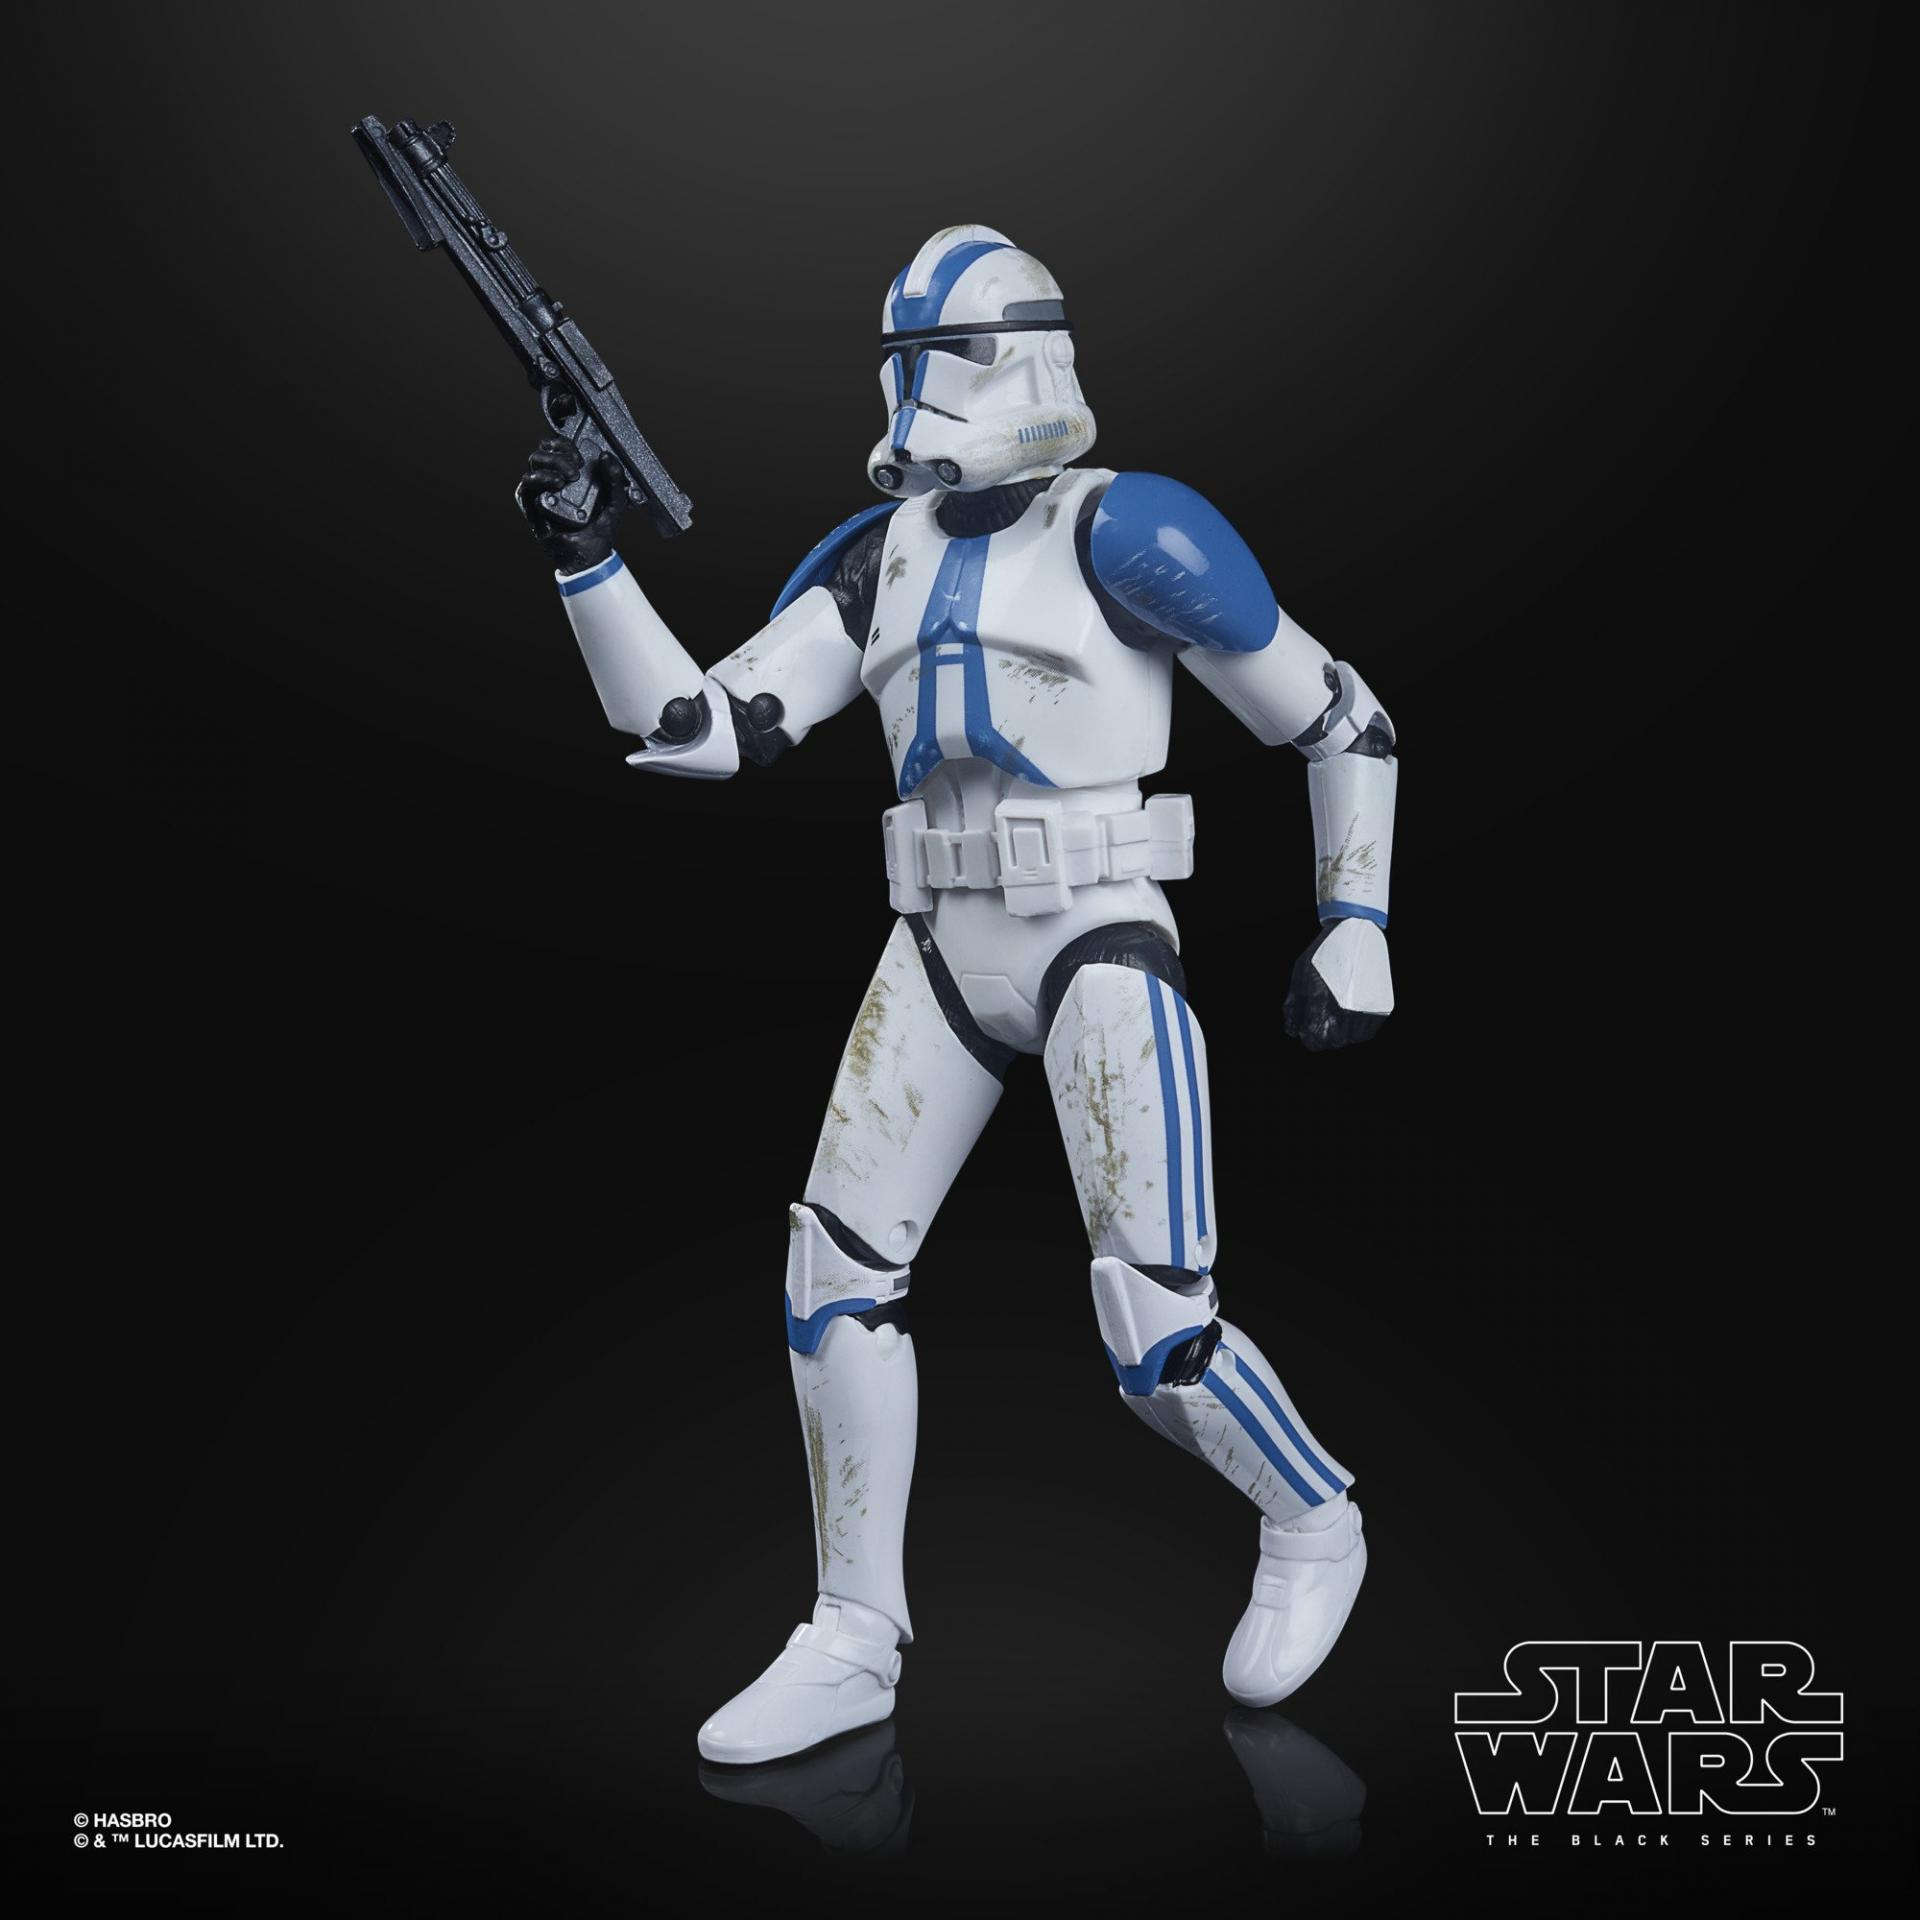 Star wars the black series archive 501st legion clone trooper 15cm1